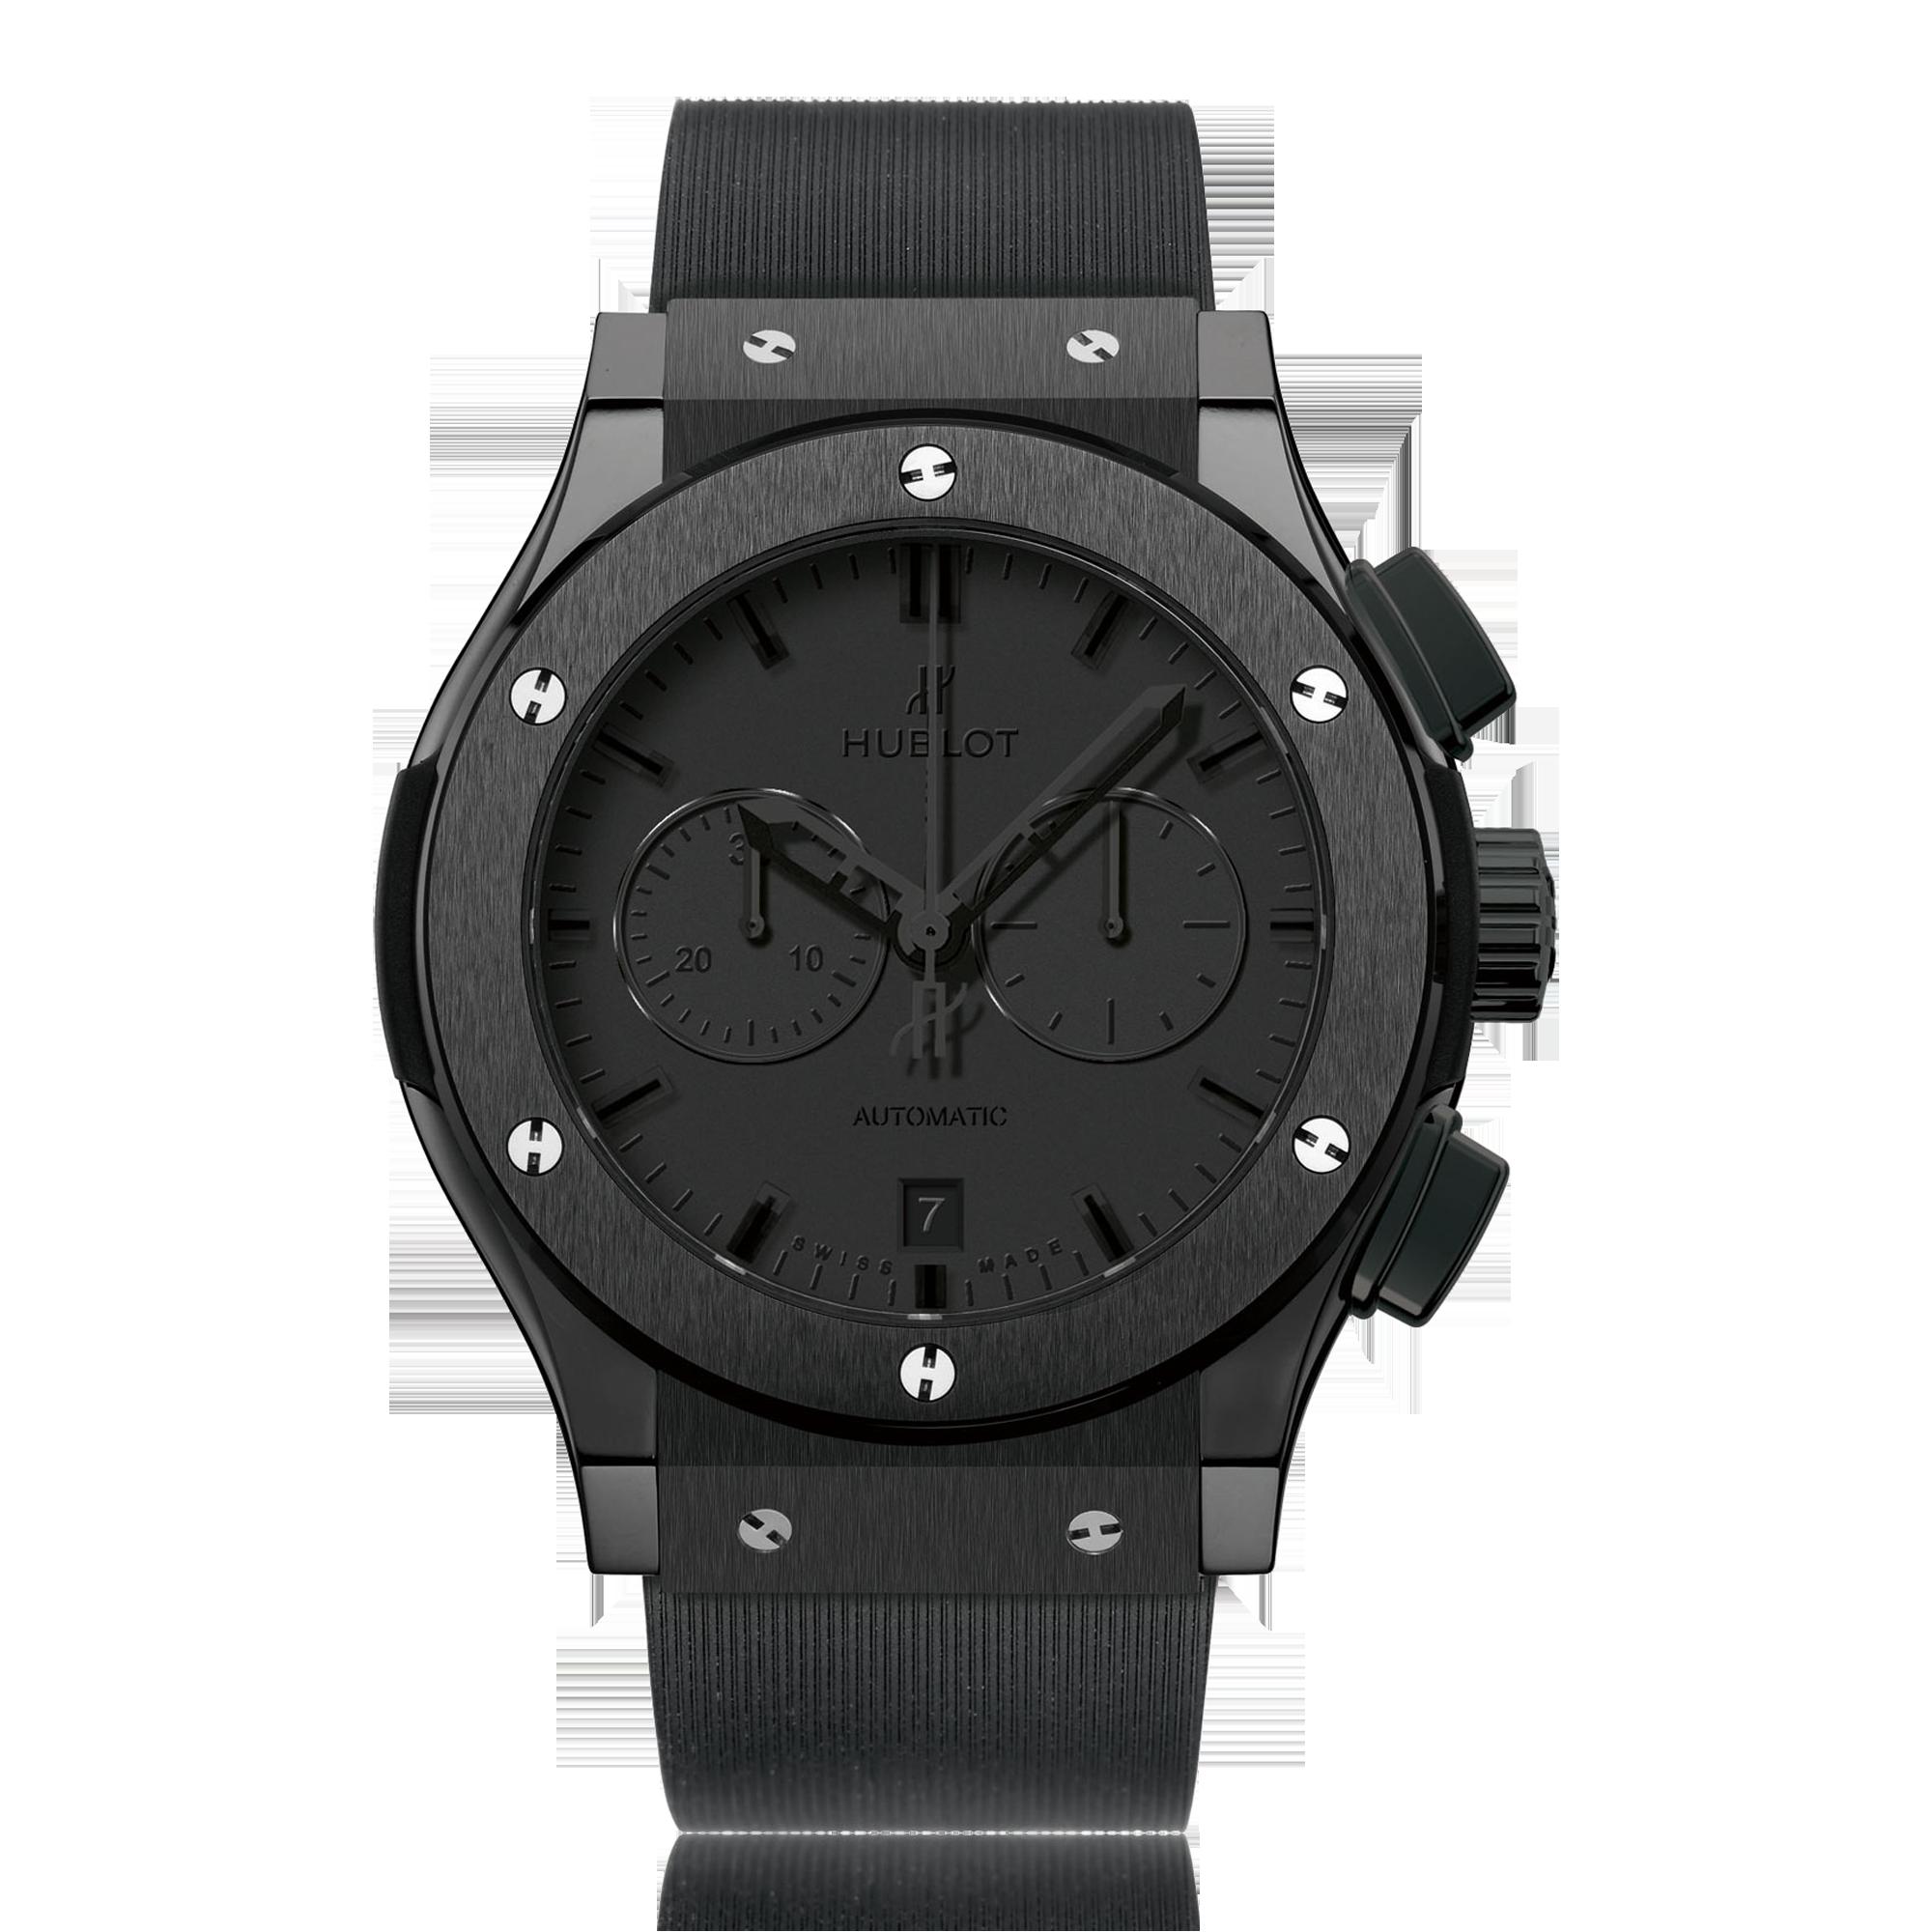 b0d484ad861 Model Hublot Classic Fusion Ceramic automatic Watch 541.CM.1110.RX ...